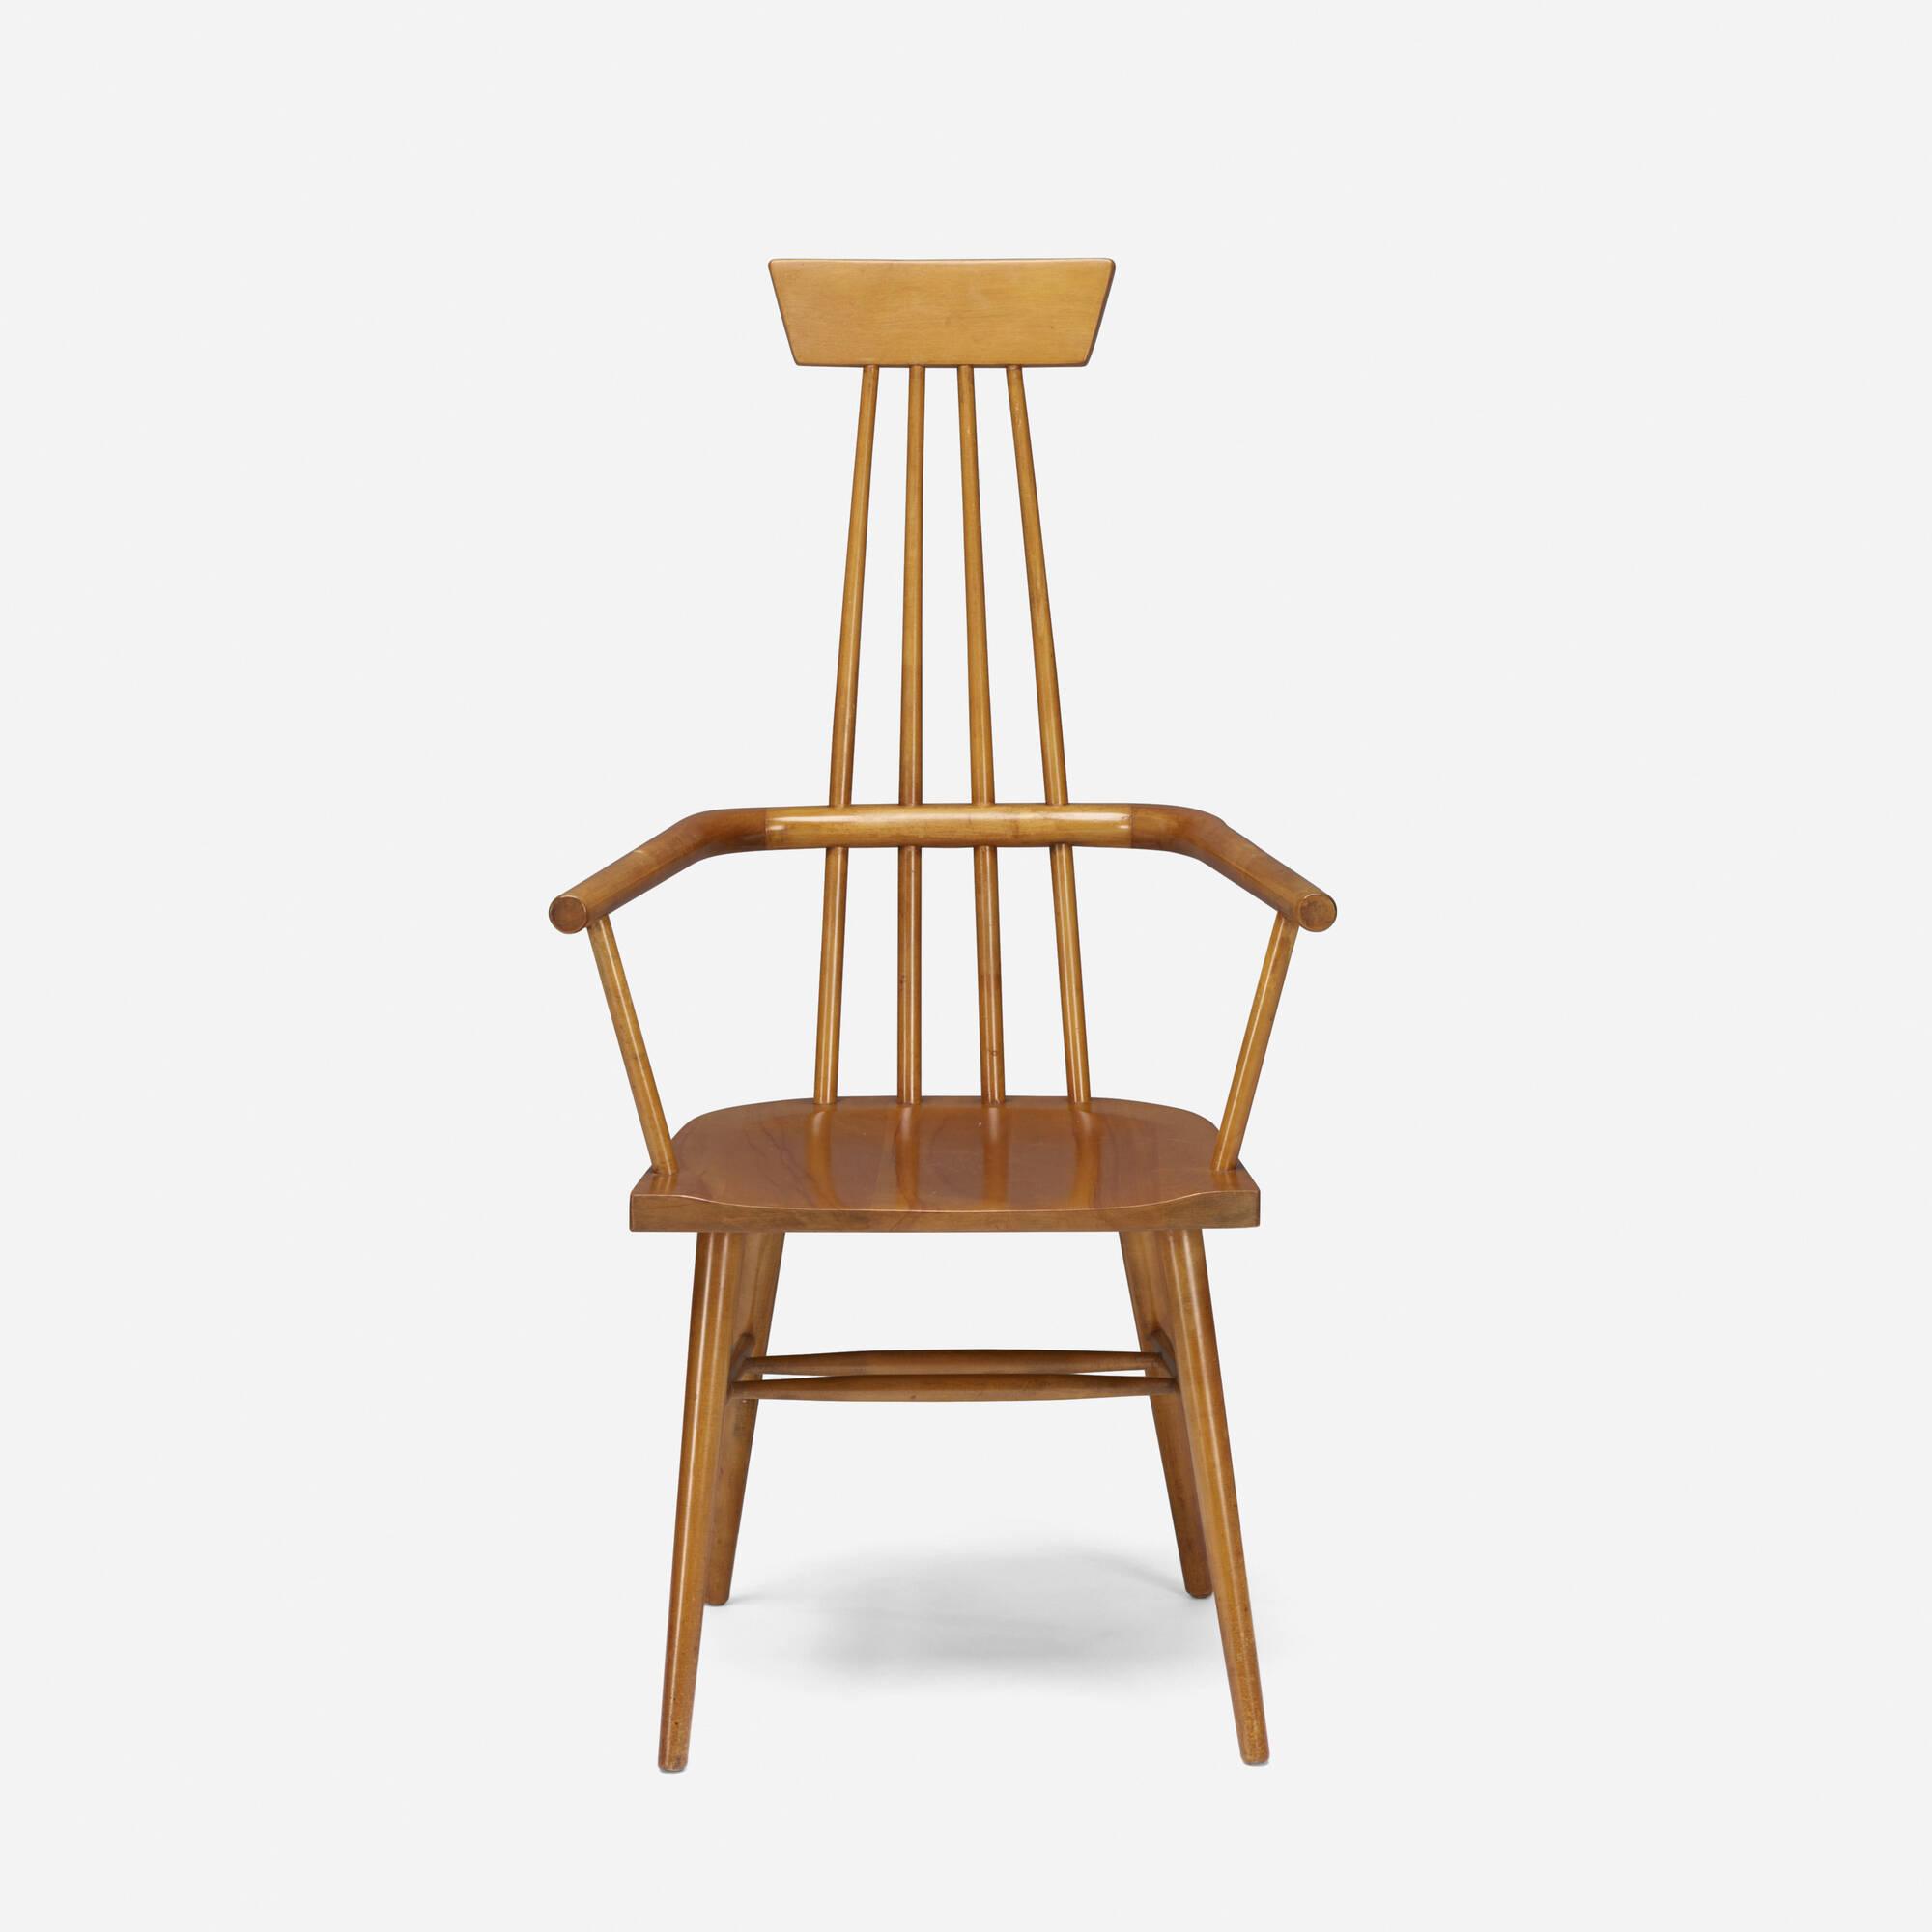 425: Paul McCobb / Windsor chair (2 of 2)